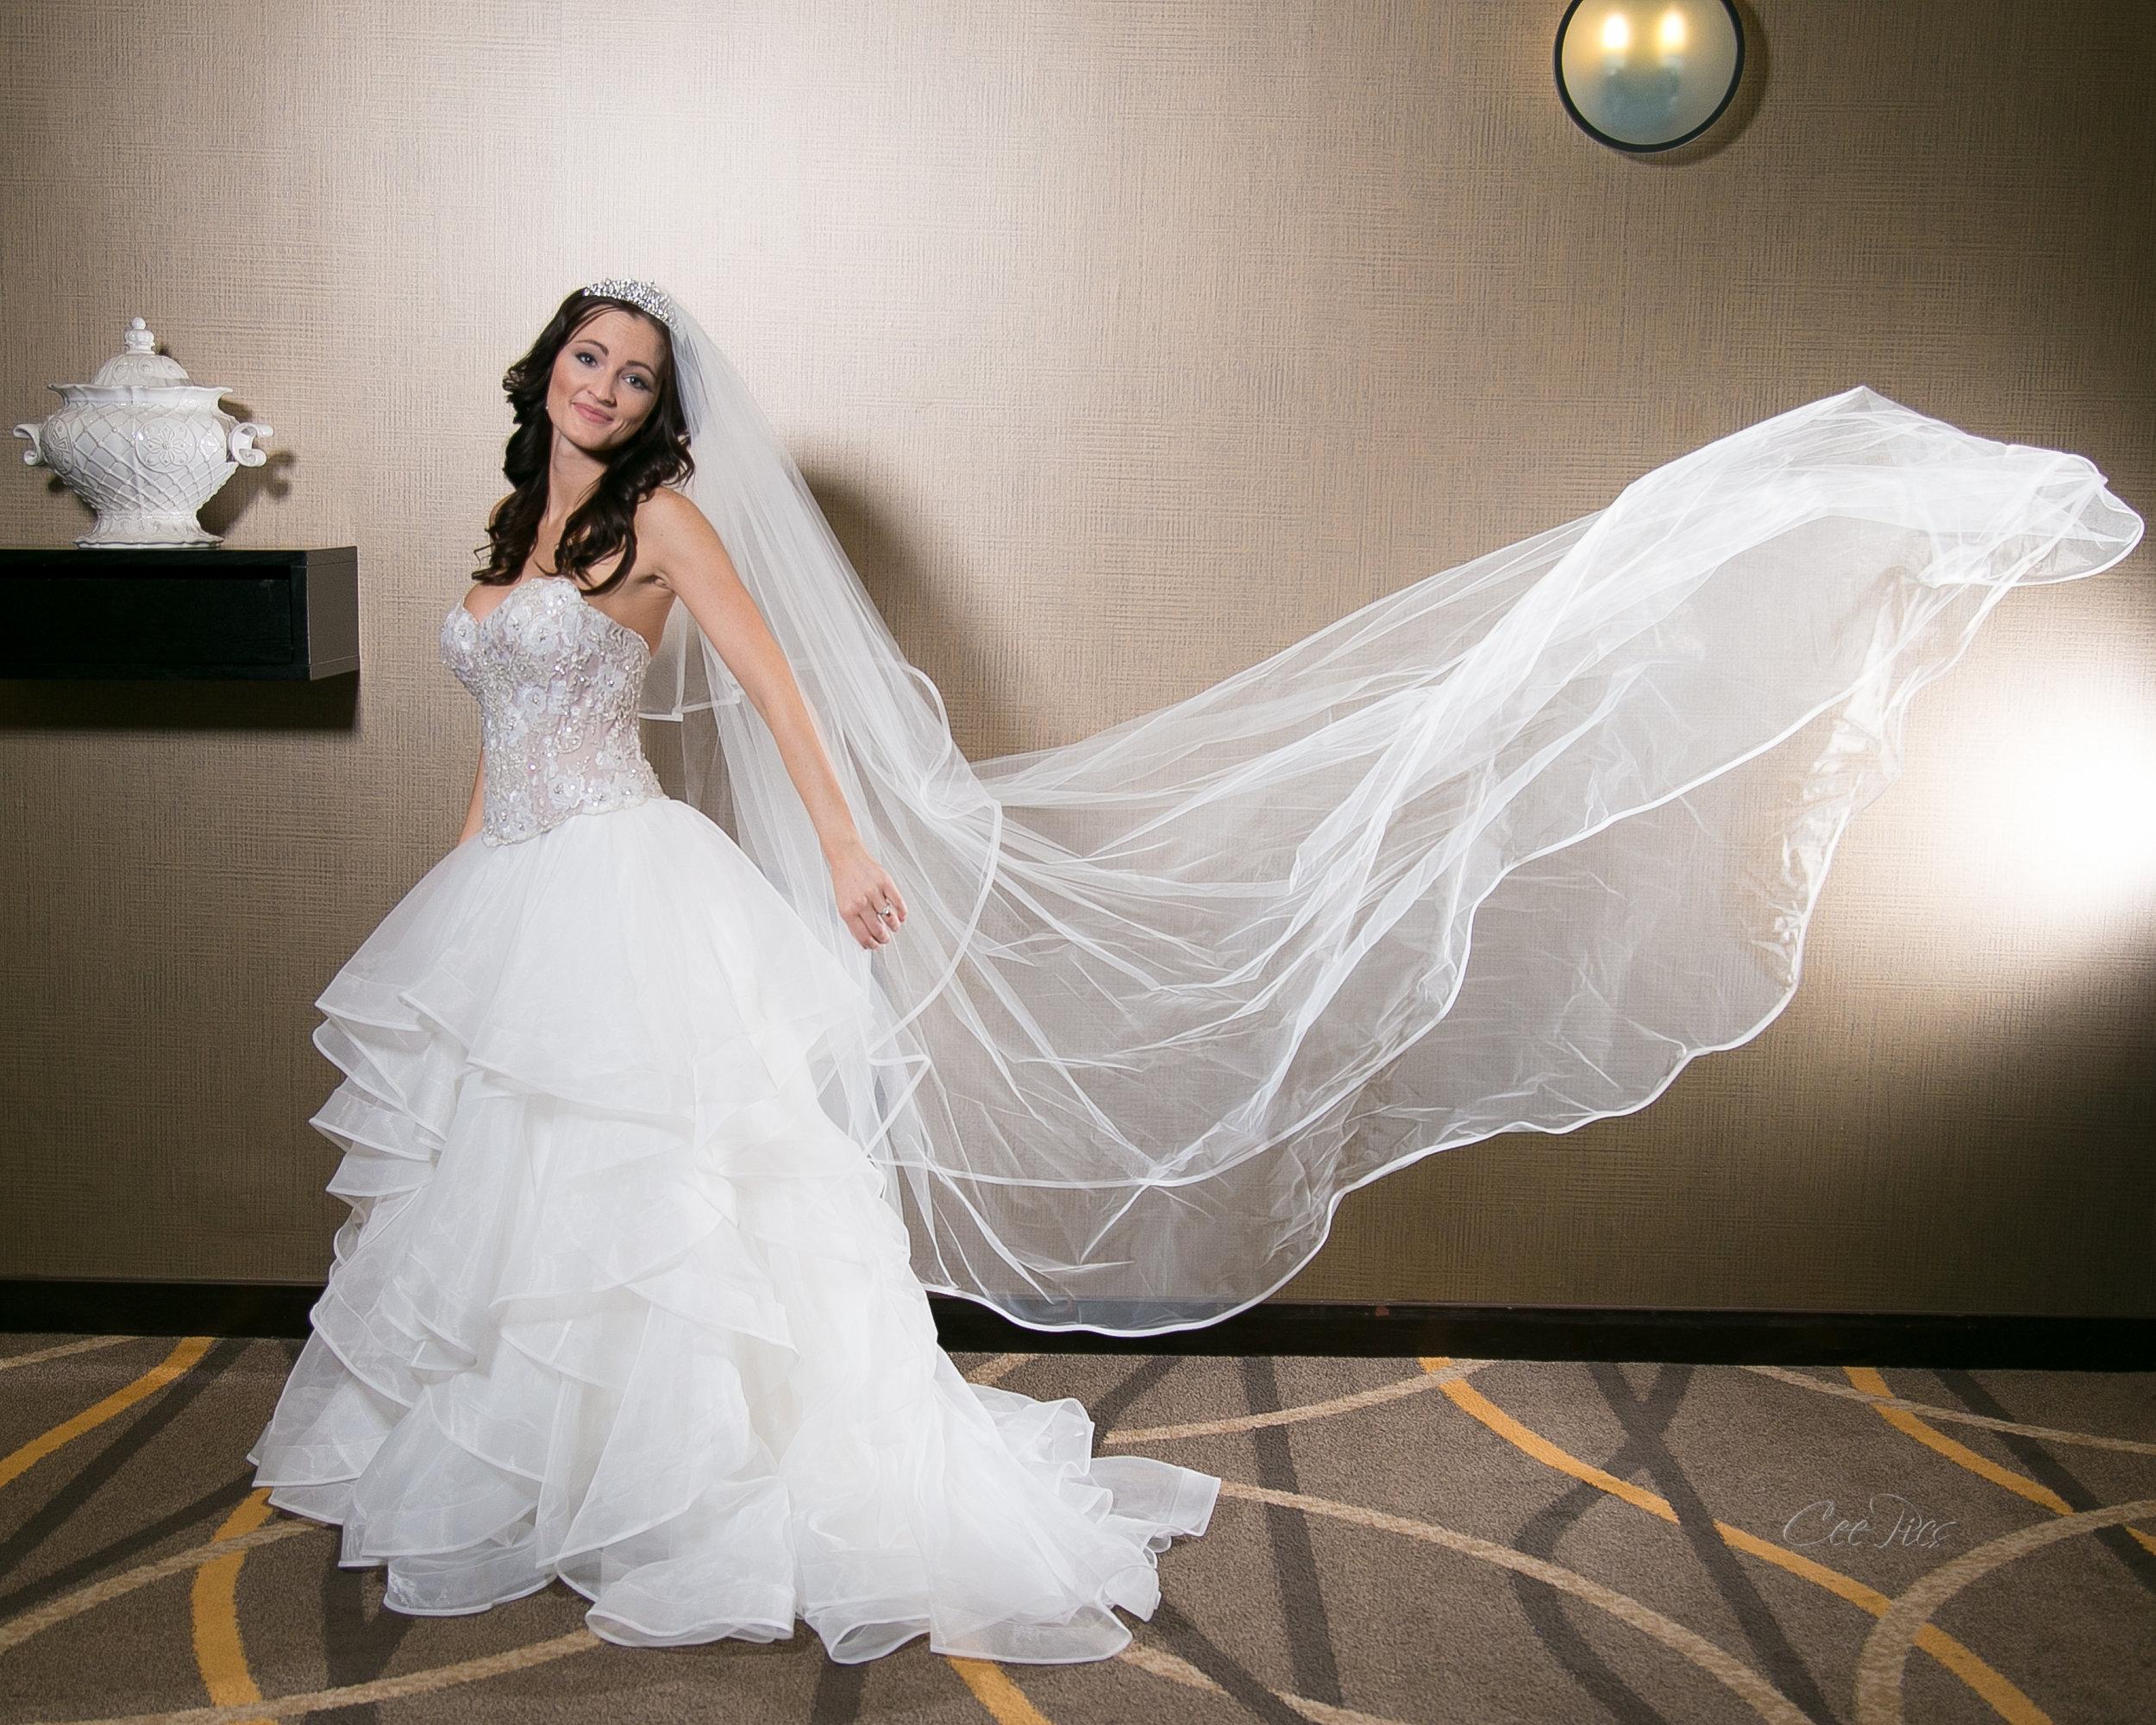 Nashville_Wedding_Photographer_Photography_DJ_MC_Lighting_Photobooth_Franklin_Bowling_Gallatin-34.jpg